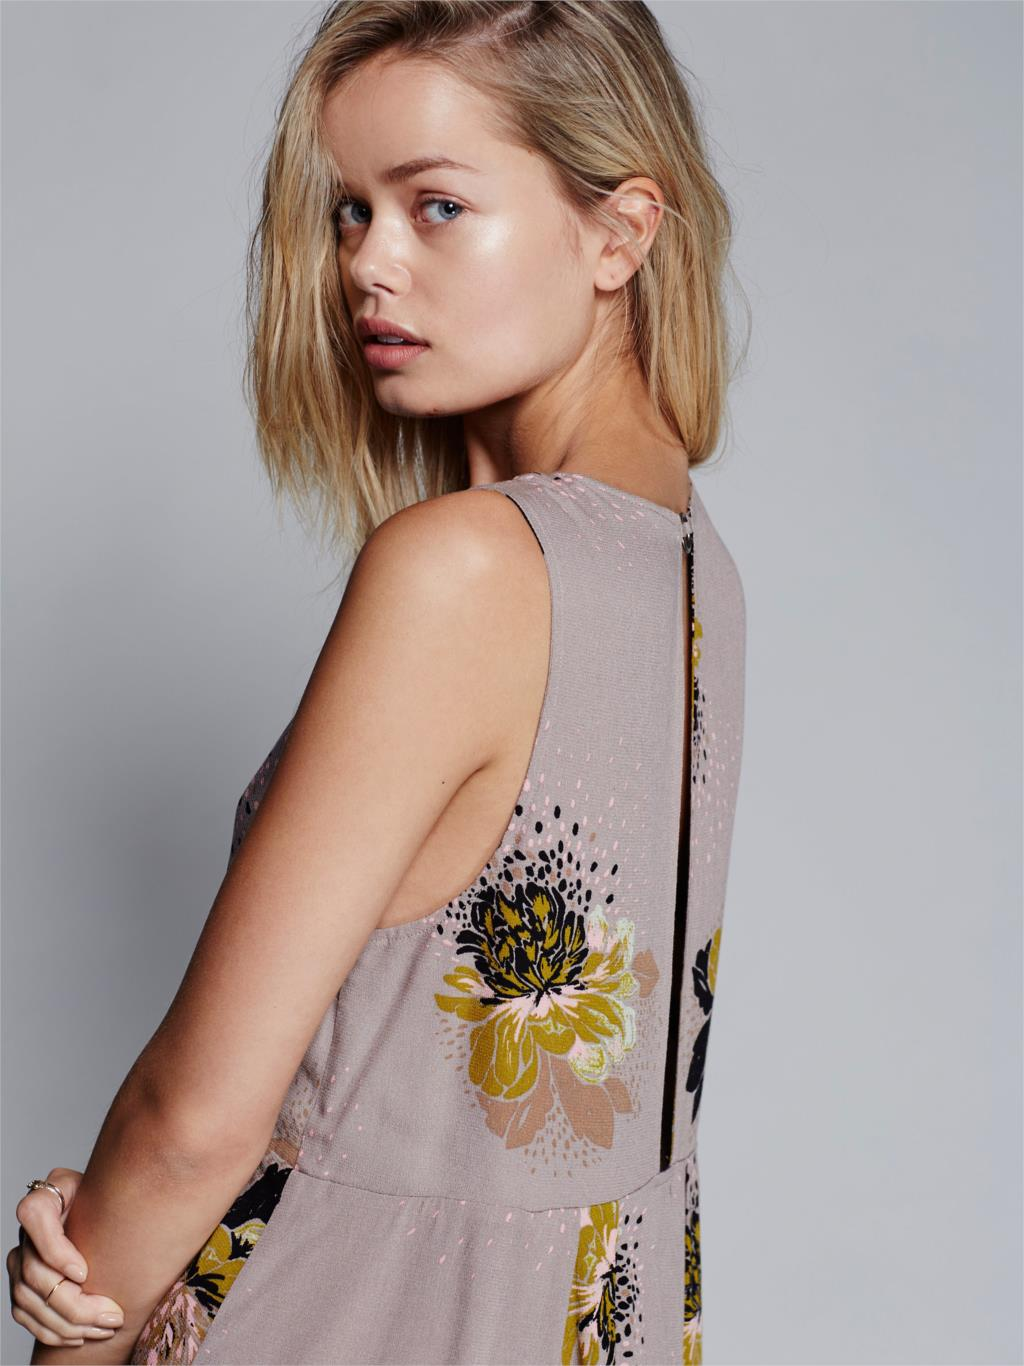 8886e7da78a3 2019 Wholesale Jastie Loveliest Day Tunic Mini Dress Flowy Plunging ...